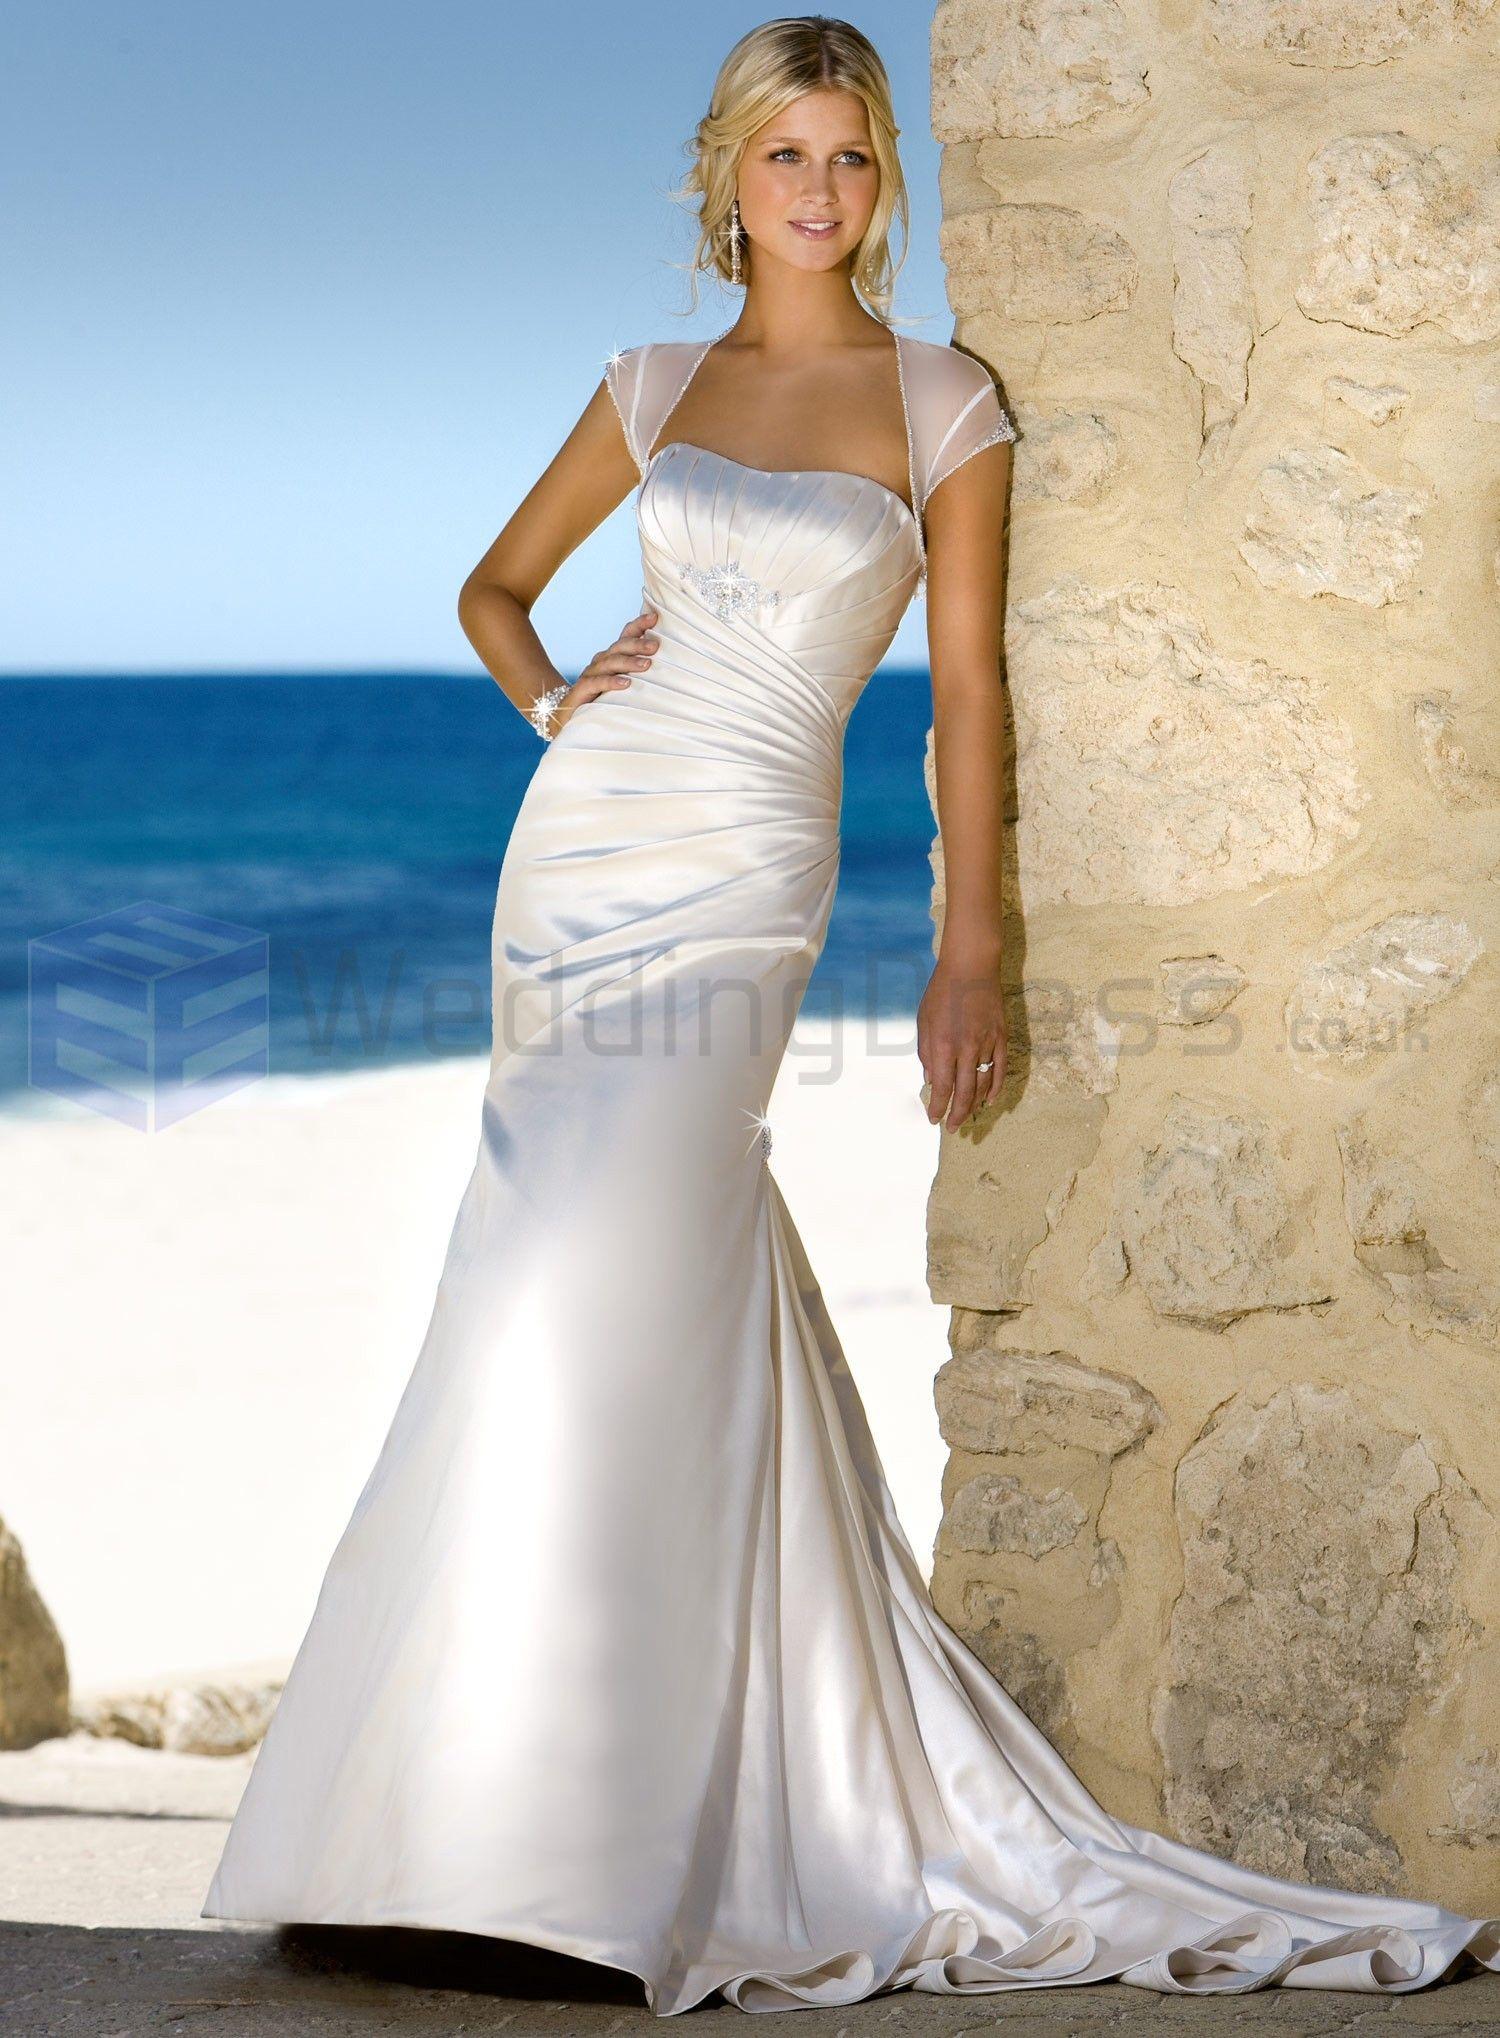 Lace Wedding Dresses With Cap Sleeves Uk Popular Wedding